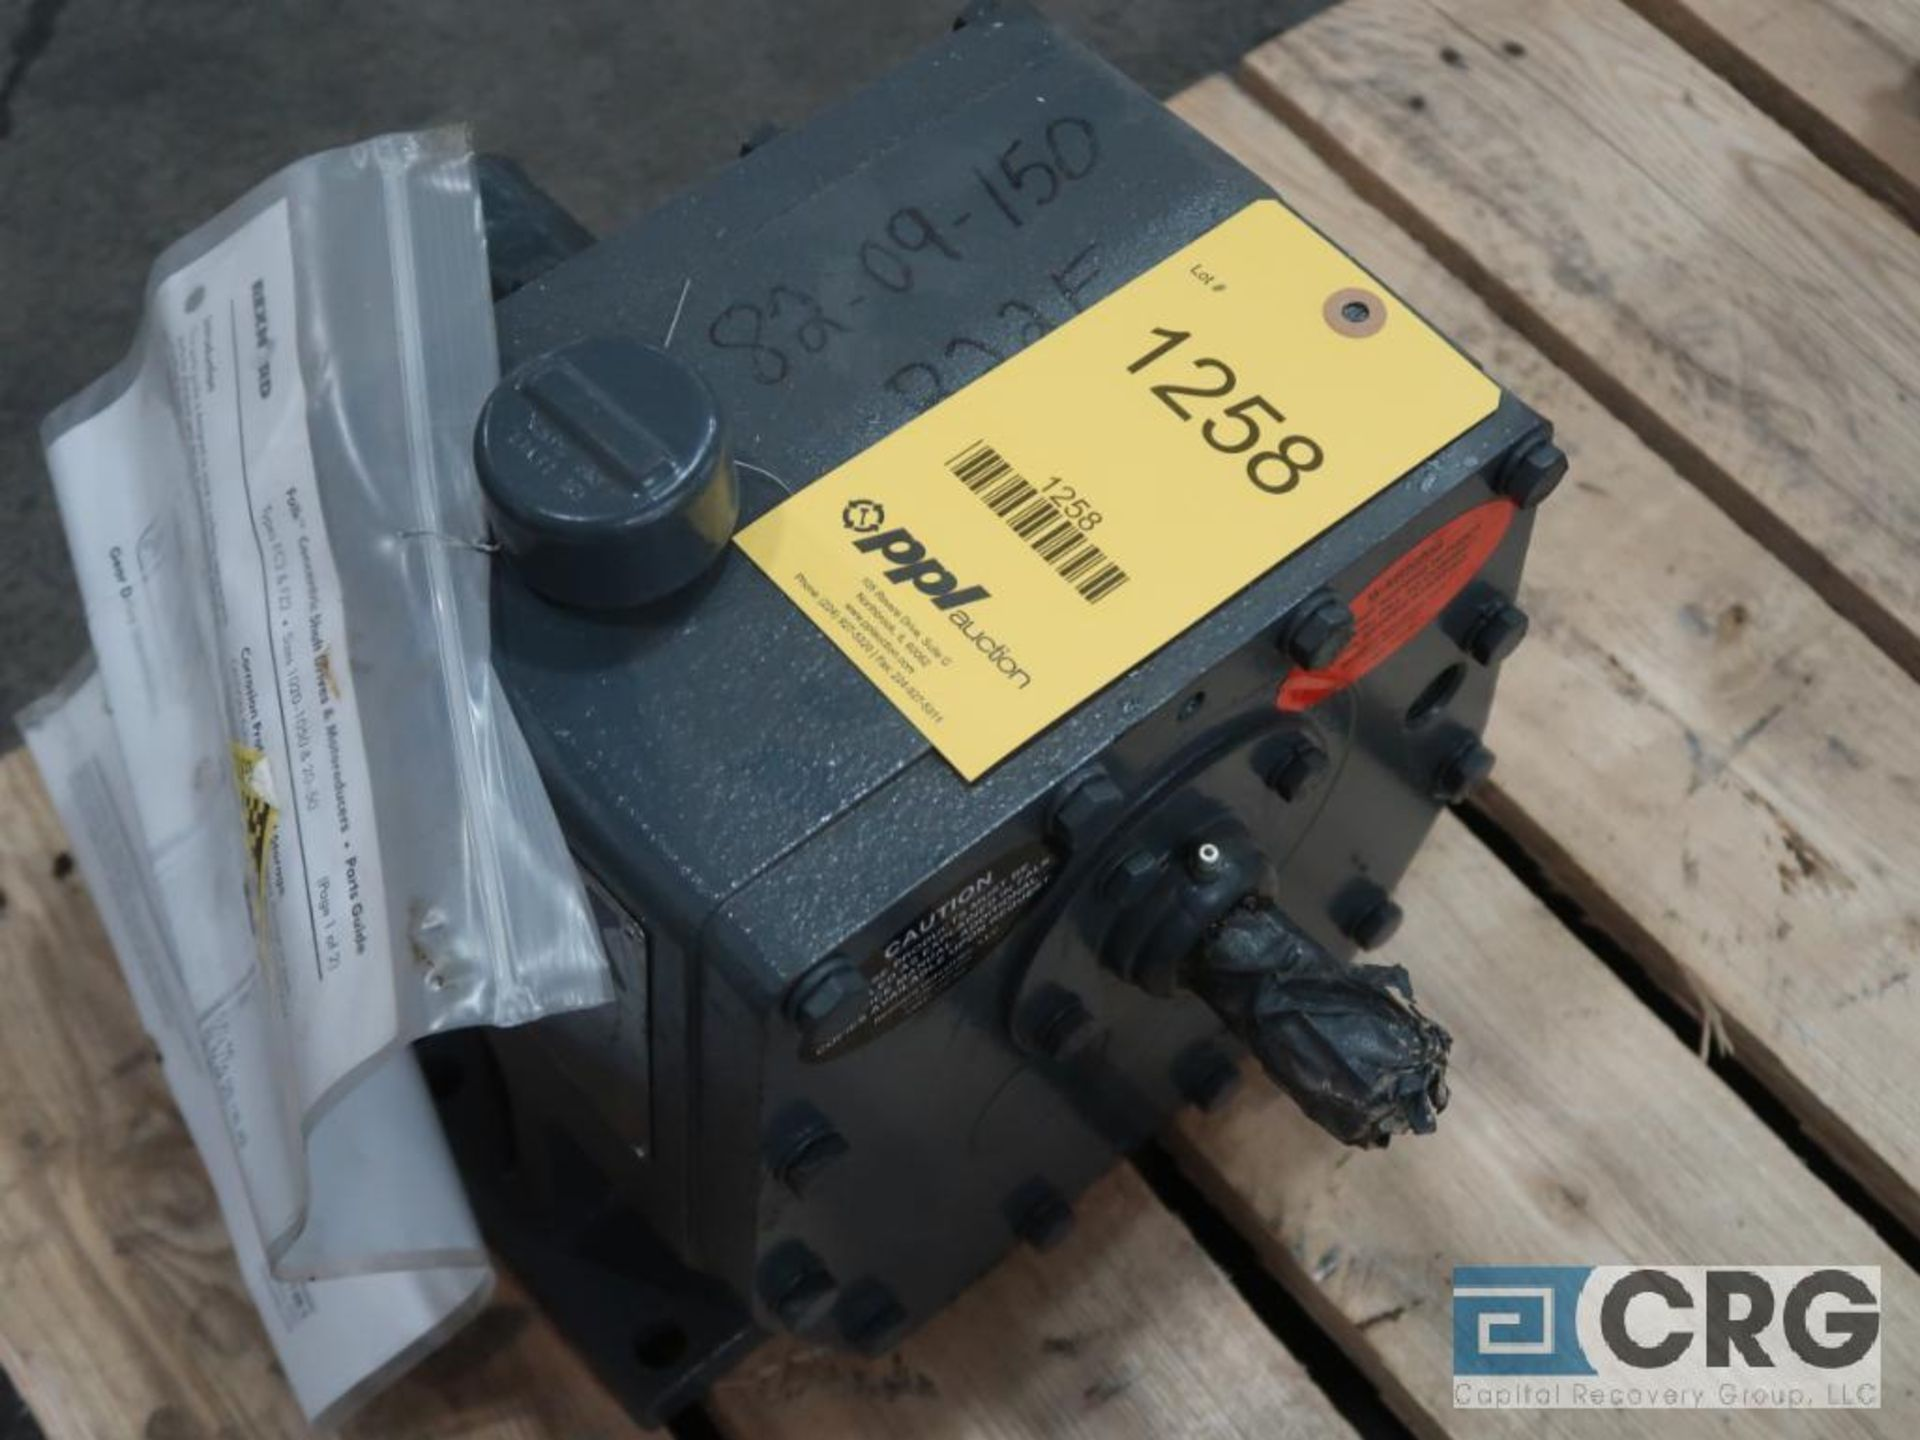 Falk 1020 FC2A gear drive, ratio 1.452, 122.07 RPM, s/n 707010 (Finish Building)